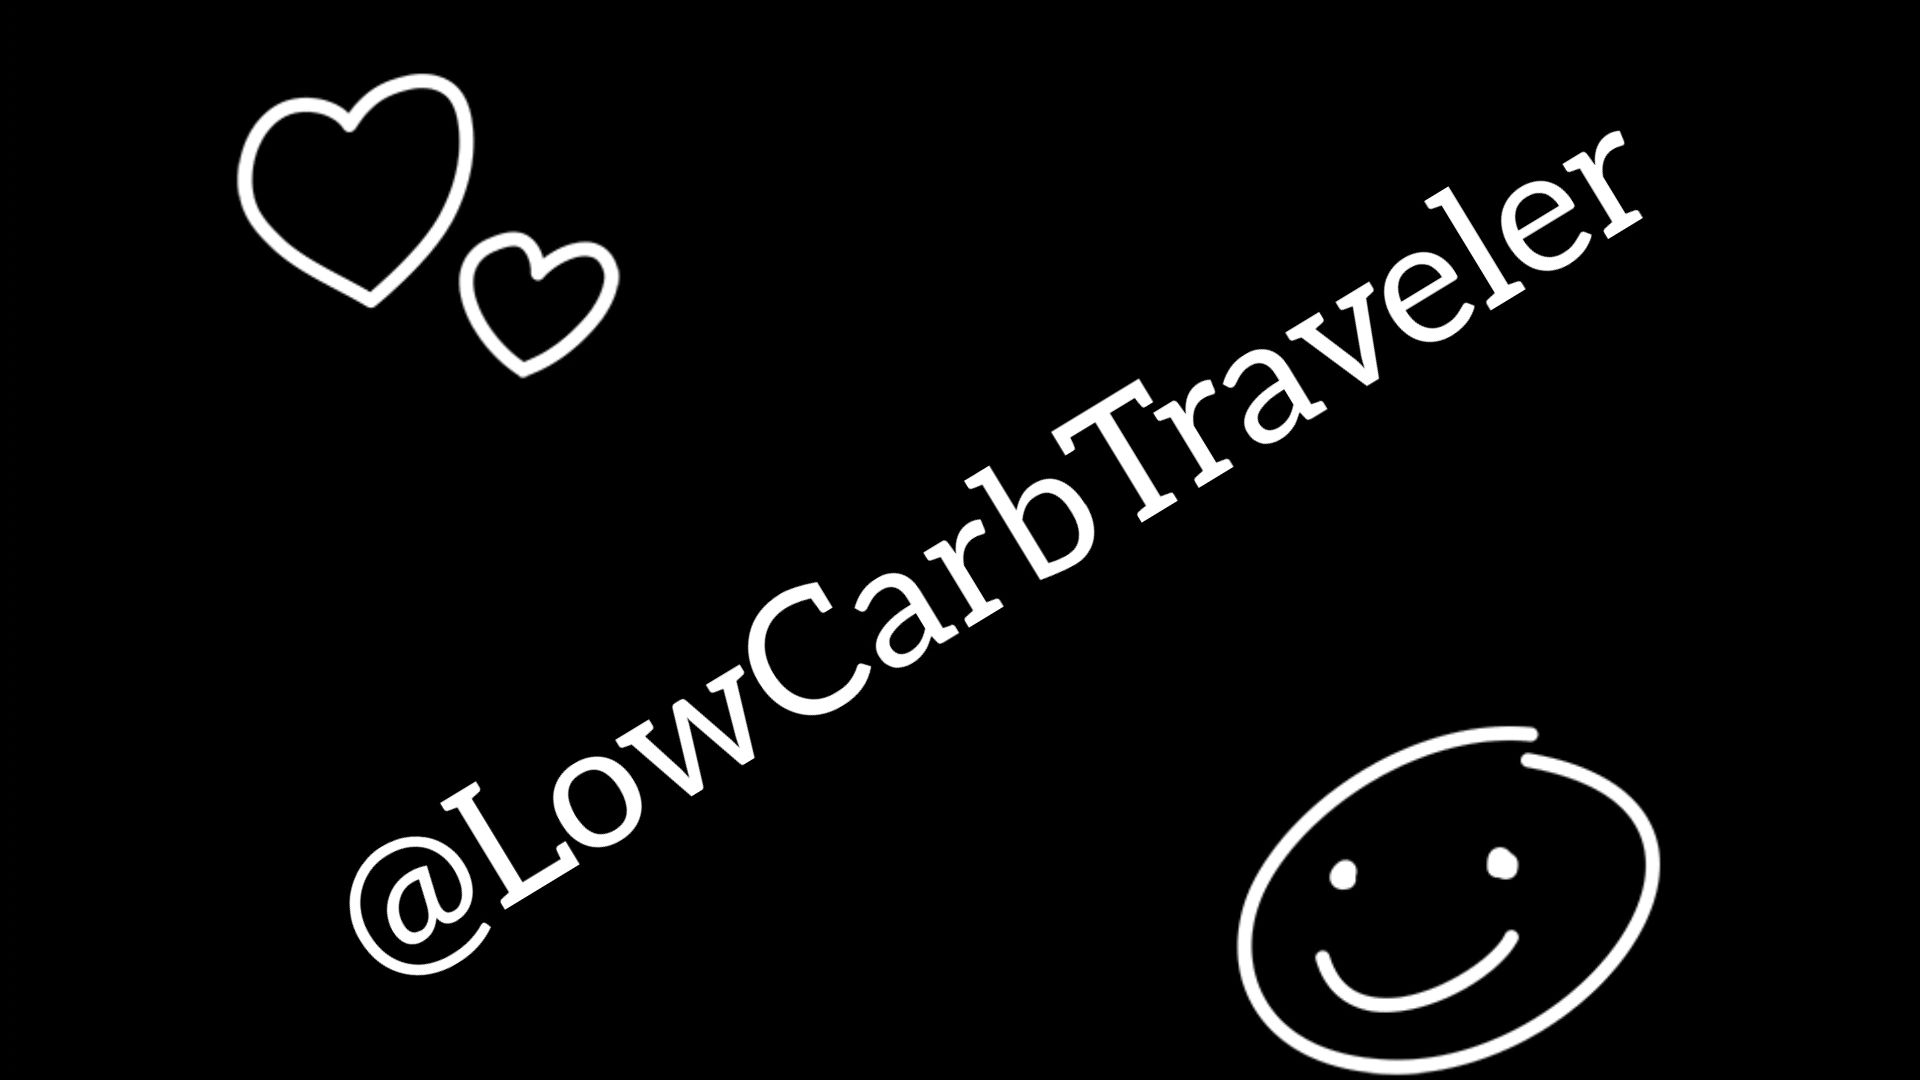 lowcarbtraveler